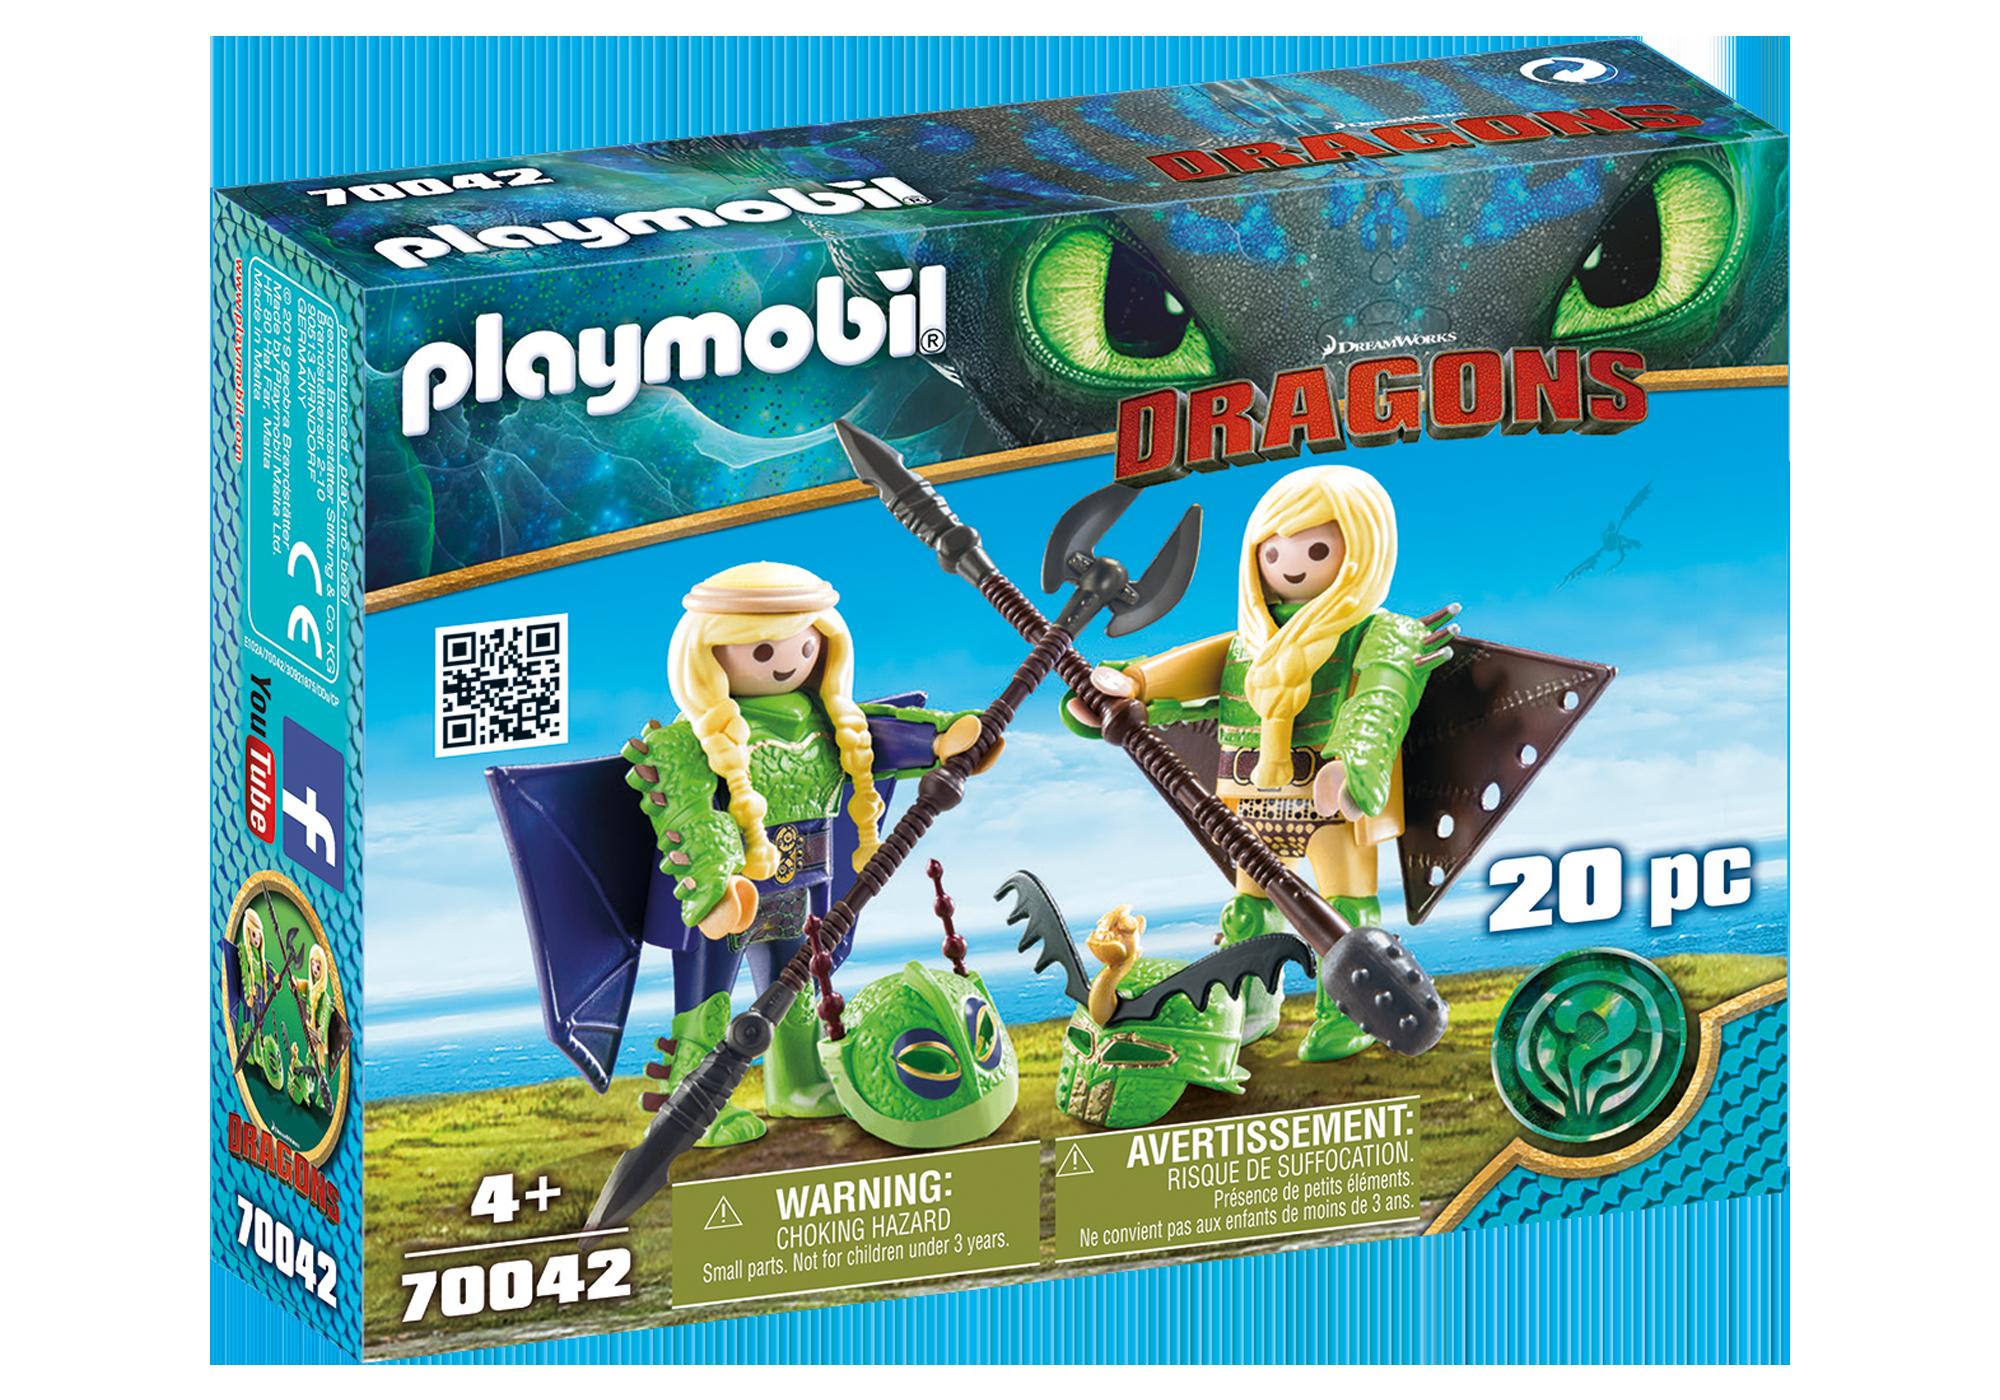 http://media.playmobil.com/i/playmobil/70042_product_box_front/Chusco y Brusca con traje volador